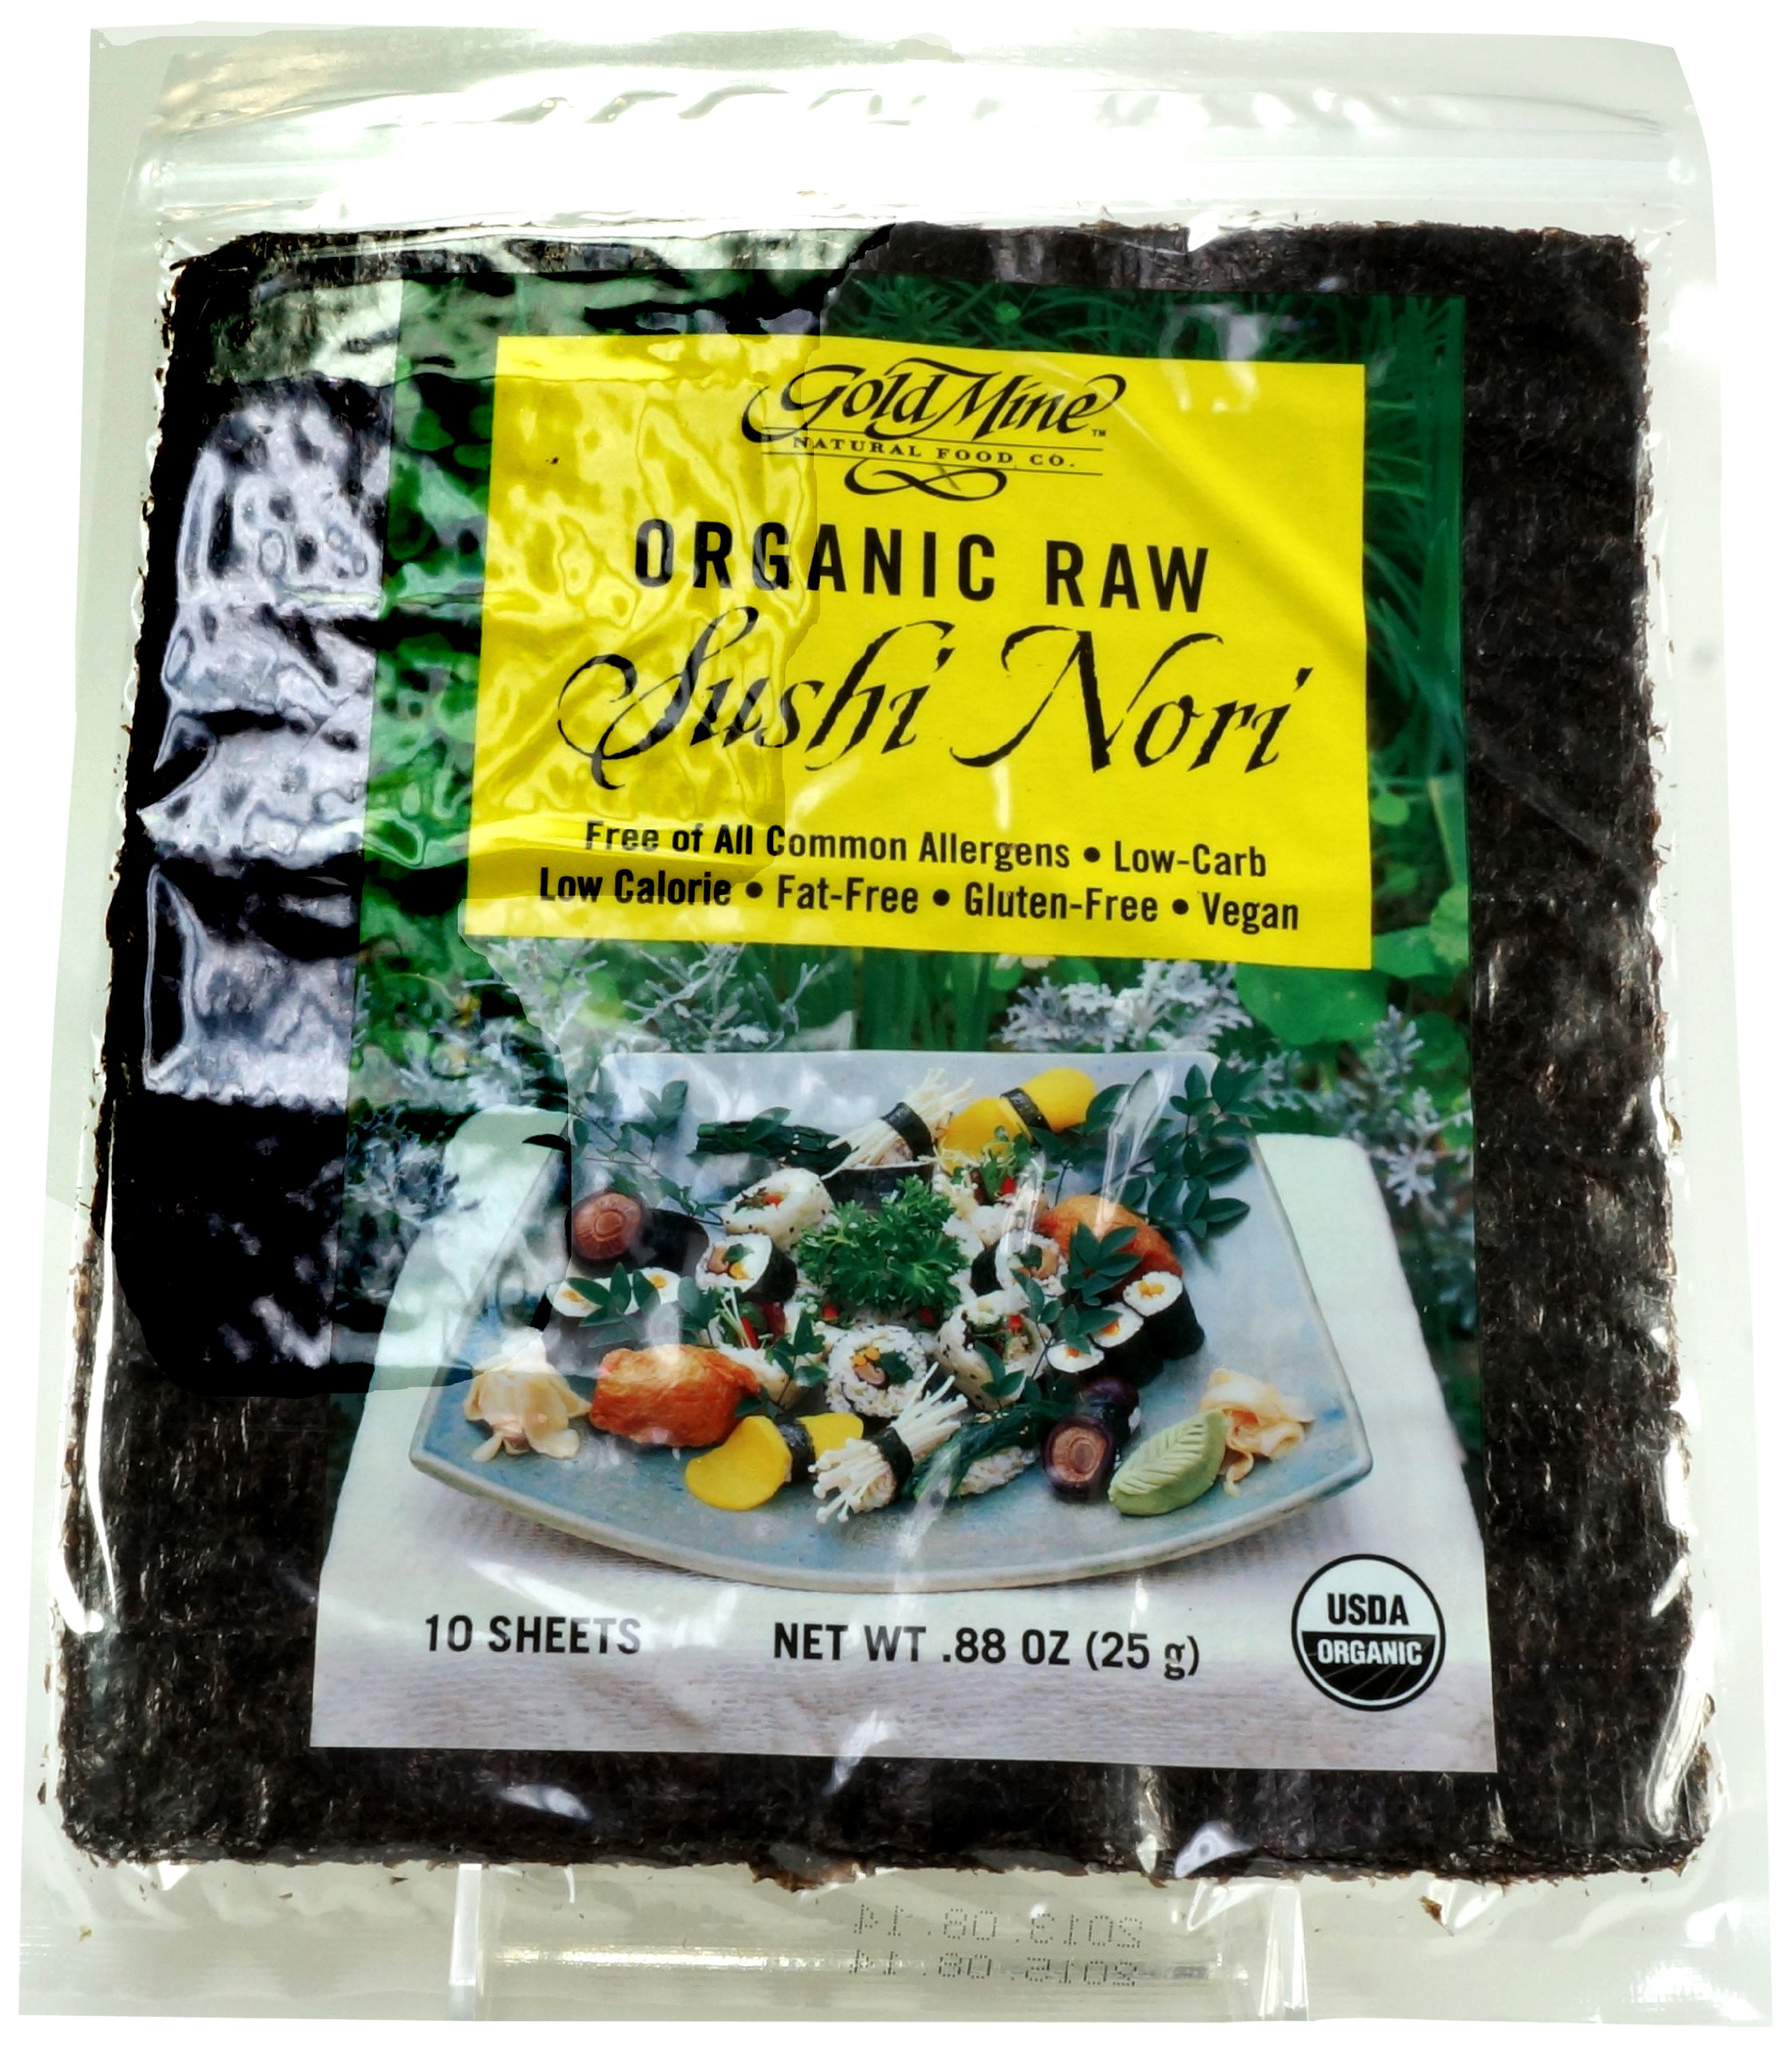 Gold Mine Organic Raw Sushi Nori, 10 Sheet, 0.88 Ounce